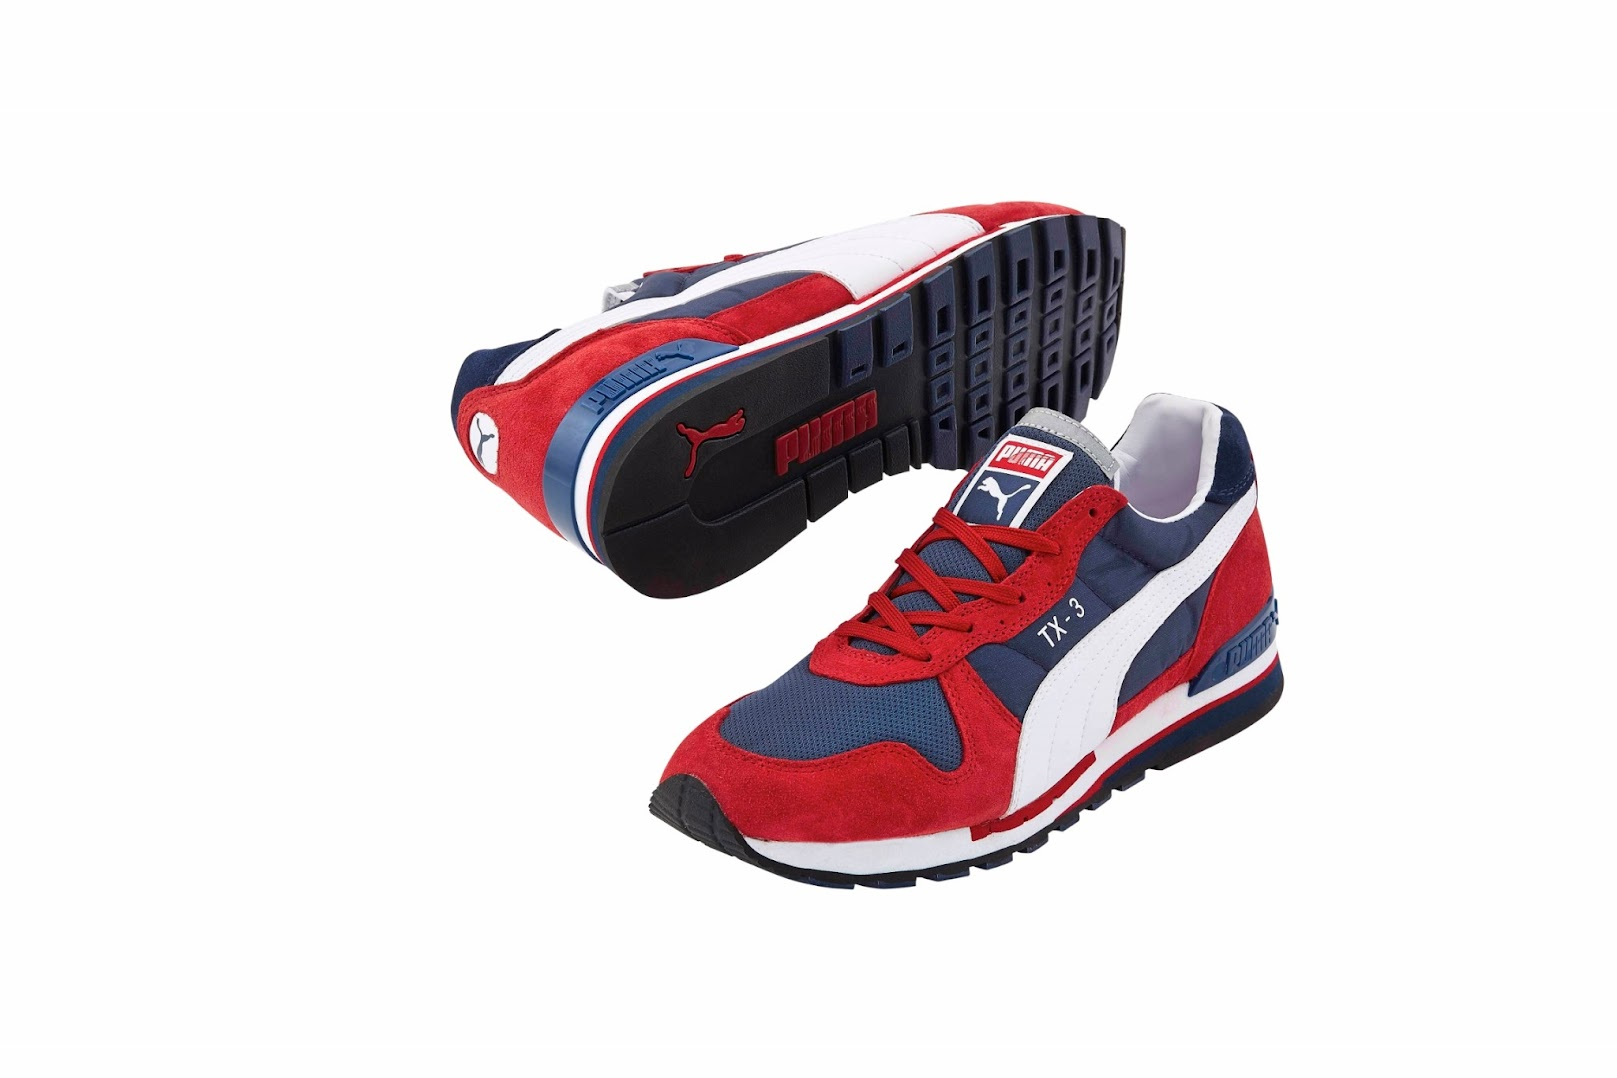 *PUMA TX-3 輕量復古慢跑鞋:重塑80年代運動風潮! 2